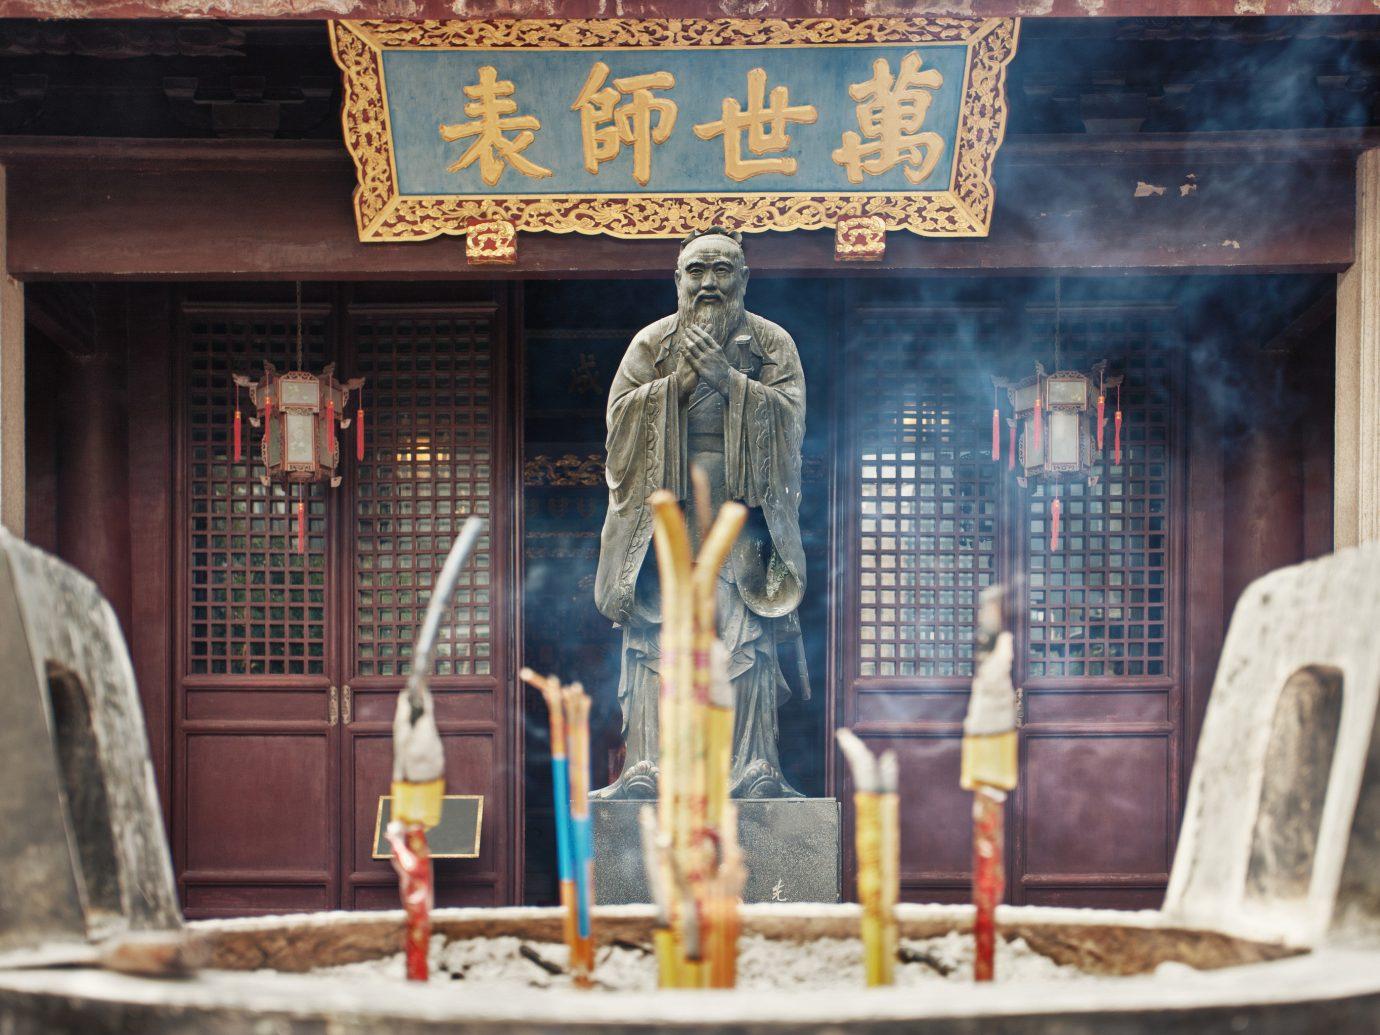 China china rose Shanghai Travel Tips Trip Ideas temple window display window